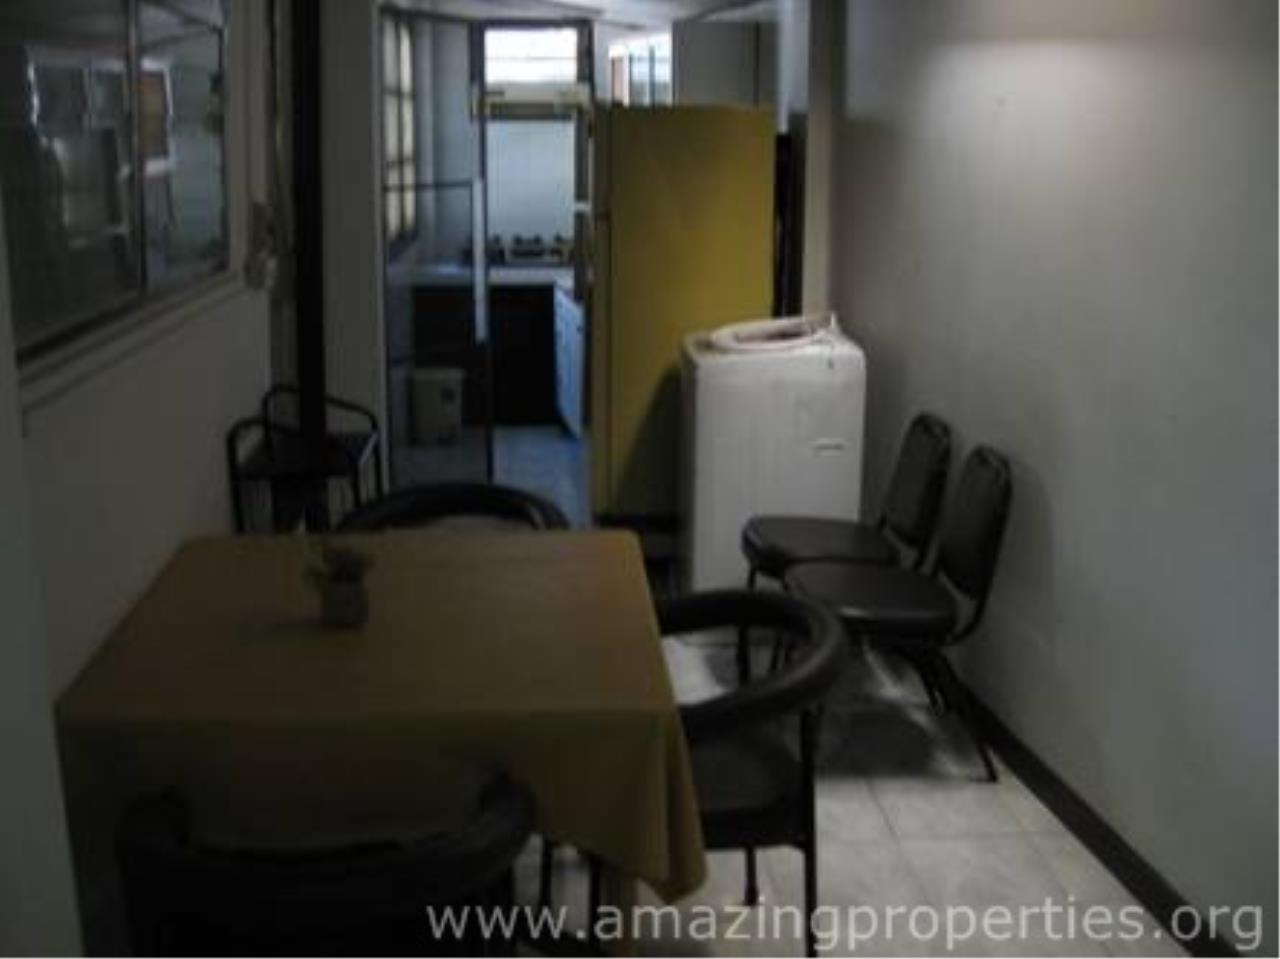 Amazing Properties Agency's 2 bedrooms House for rent 7